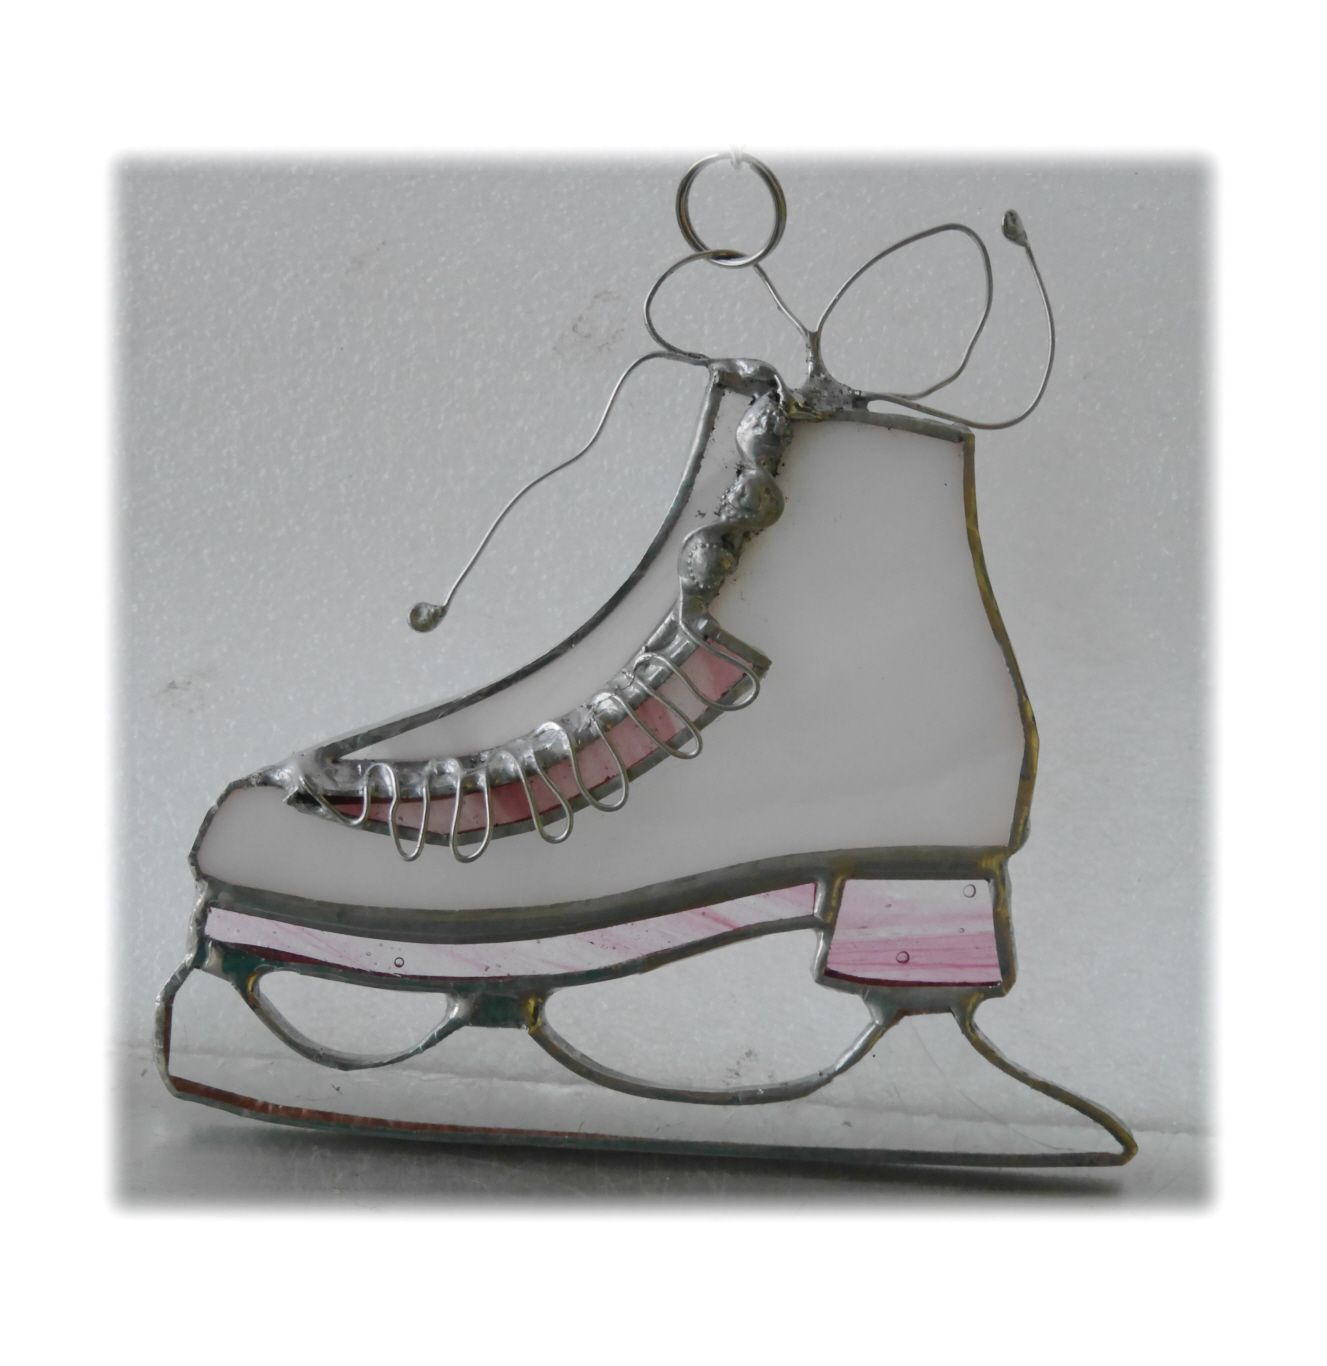 Ice Skate 010 #1901 FREE 13.00